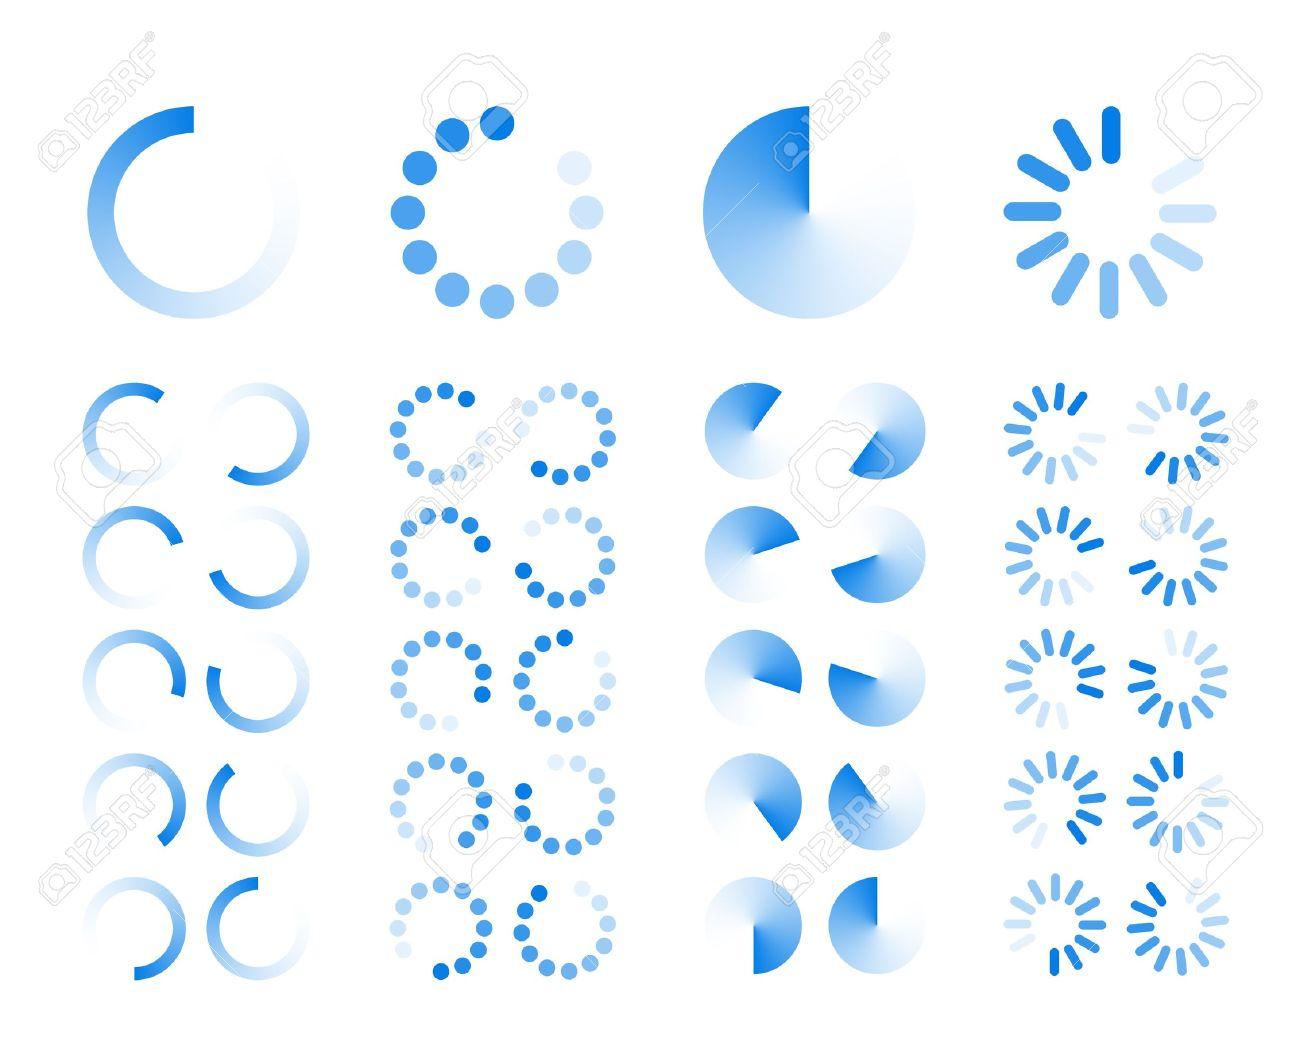 Transparent Progress Indicators icons isolated on white background Stock Vector - 18844825